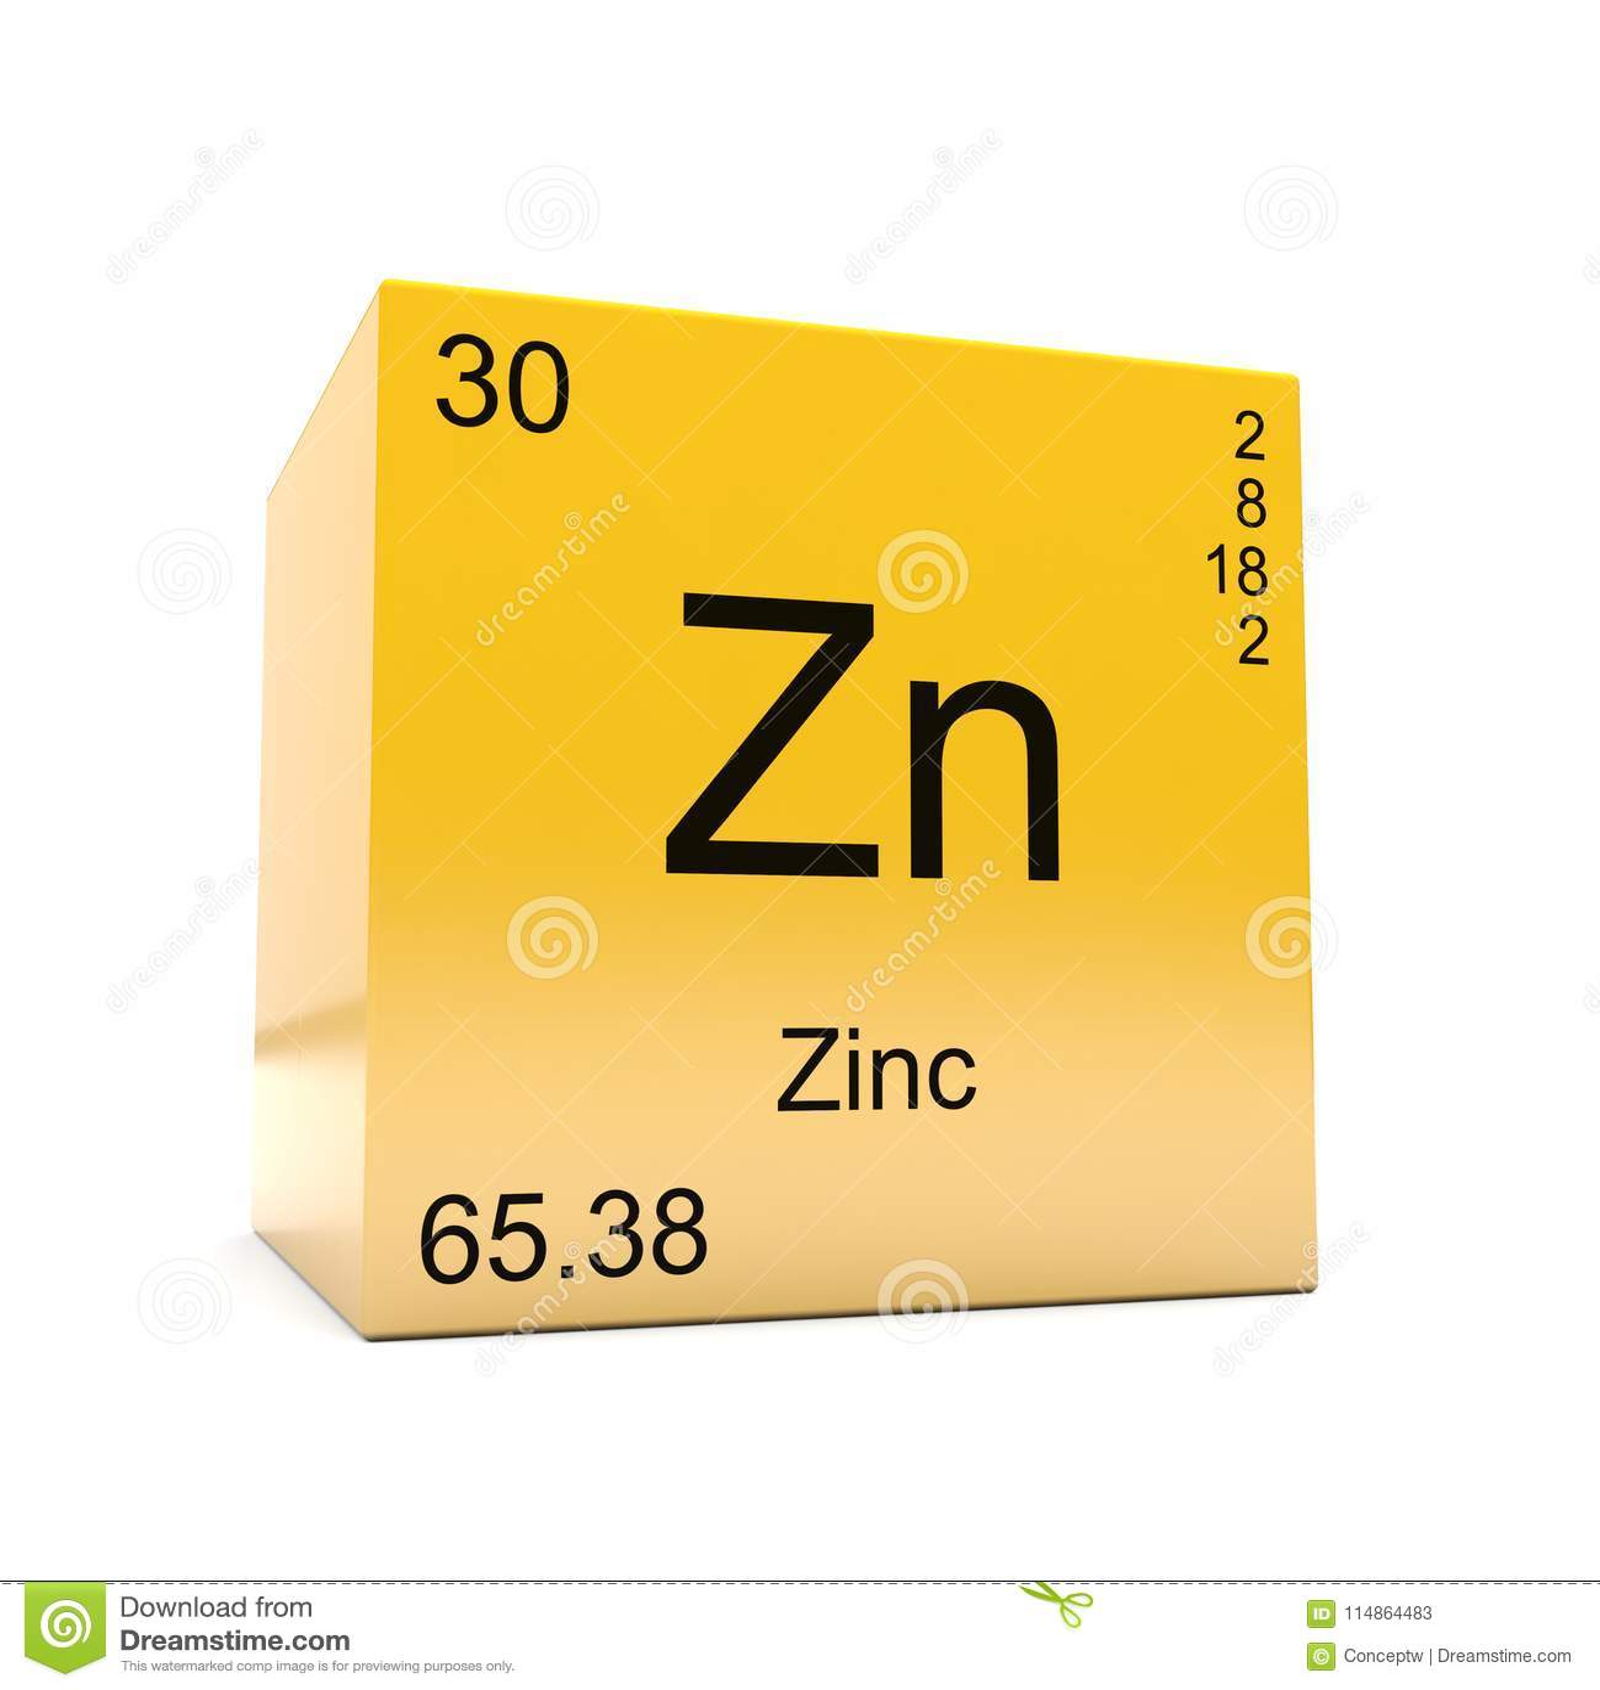 Smbolo del elemento qumico del cinc de la tabla peridica stock de download smbolo del elemento qumico del cinc de la tabla peridica stock de ilustracin ilustracin urtaz Images